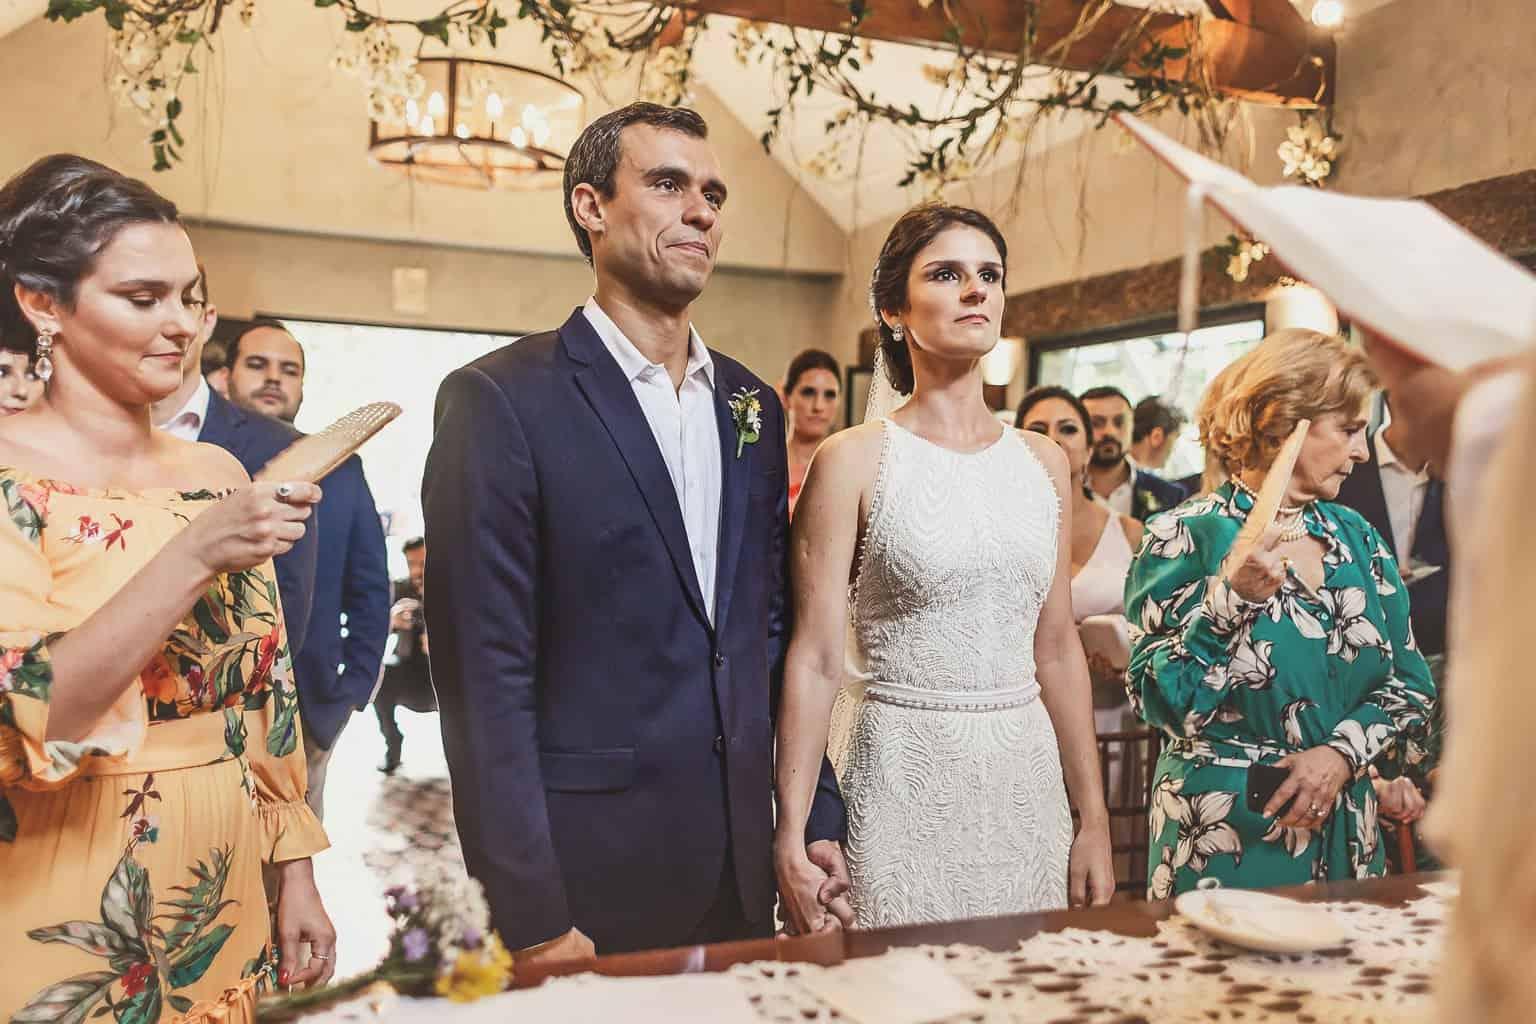 casamento-Ana-Cecilia-e-Leonardo-casamento-na-serra-cerimonia-graviola-filmes-graviolafilmes-laura-camapnella-de-siervi-lauracampanella-studio-laura-camapnella20